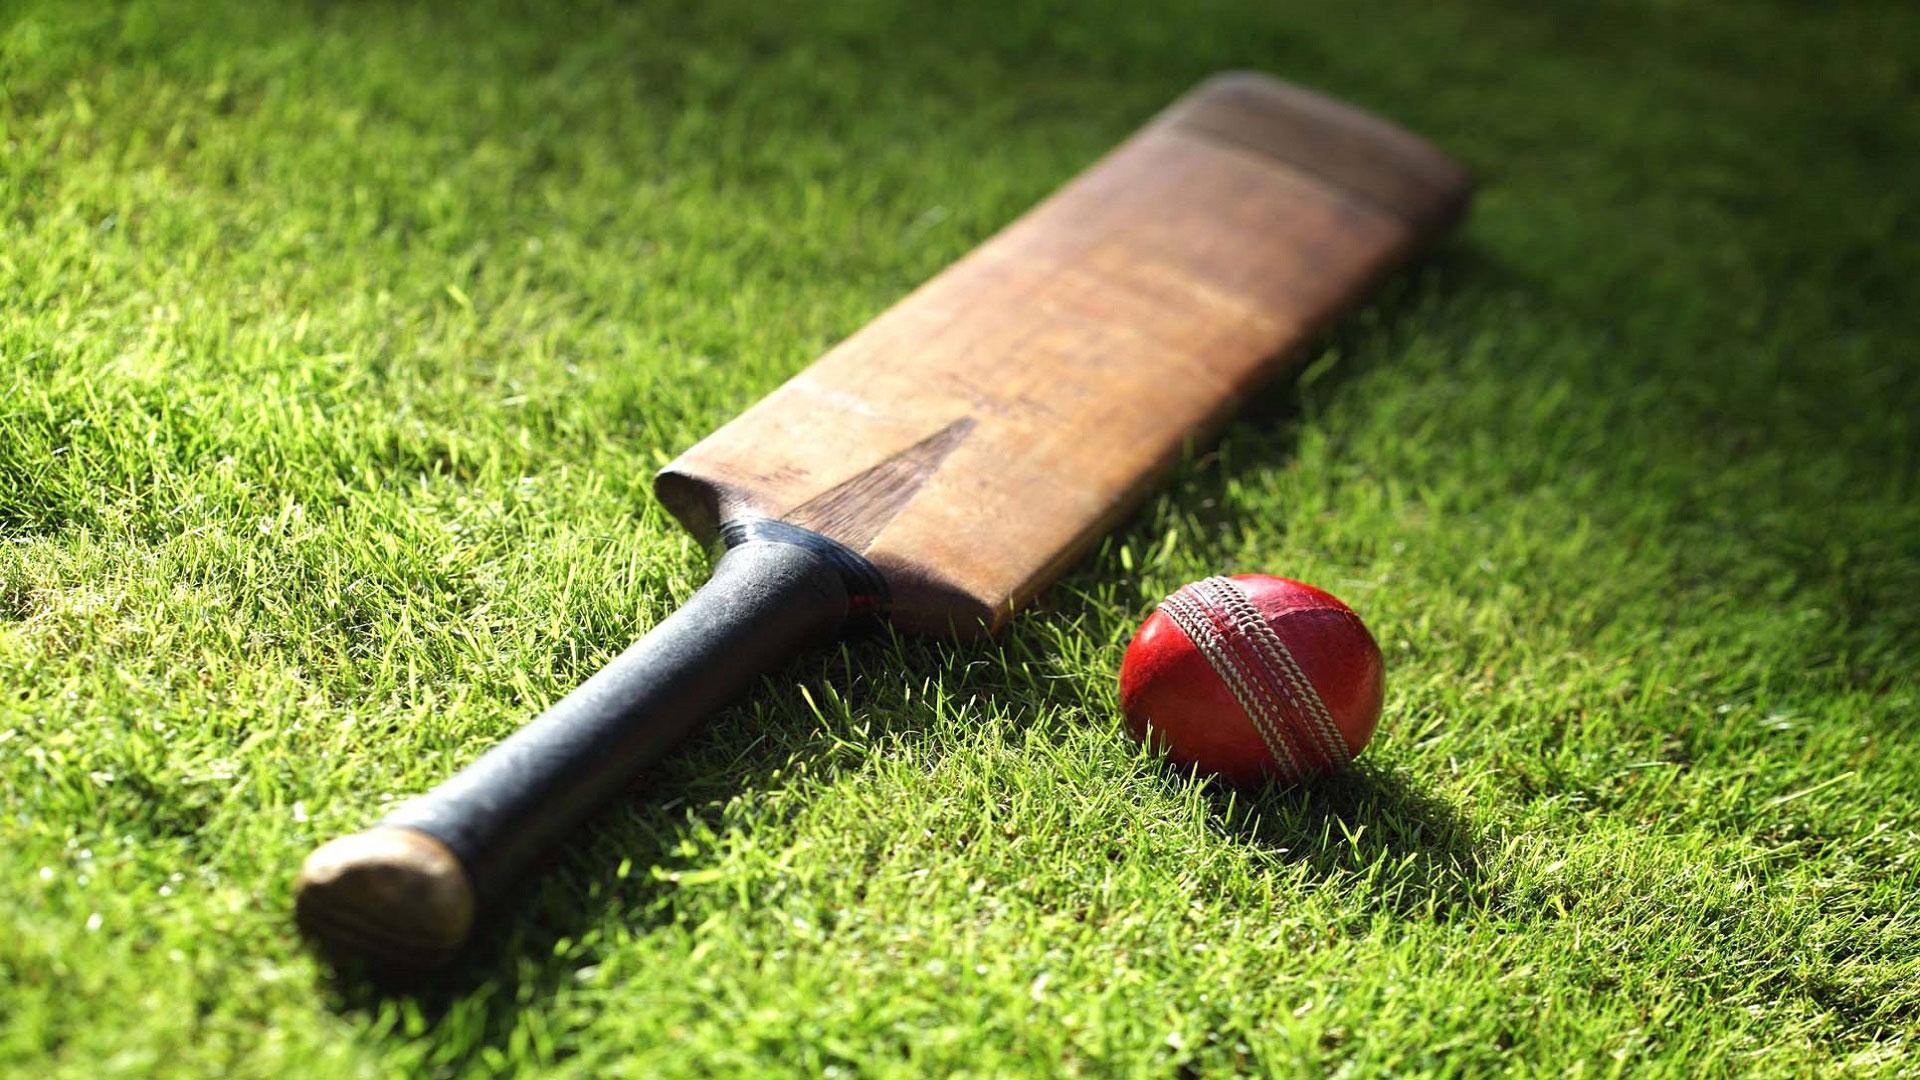 Cricket Bate